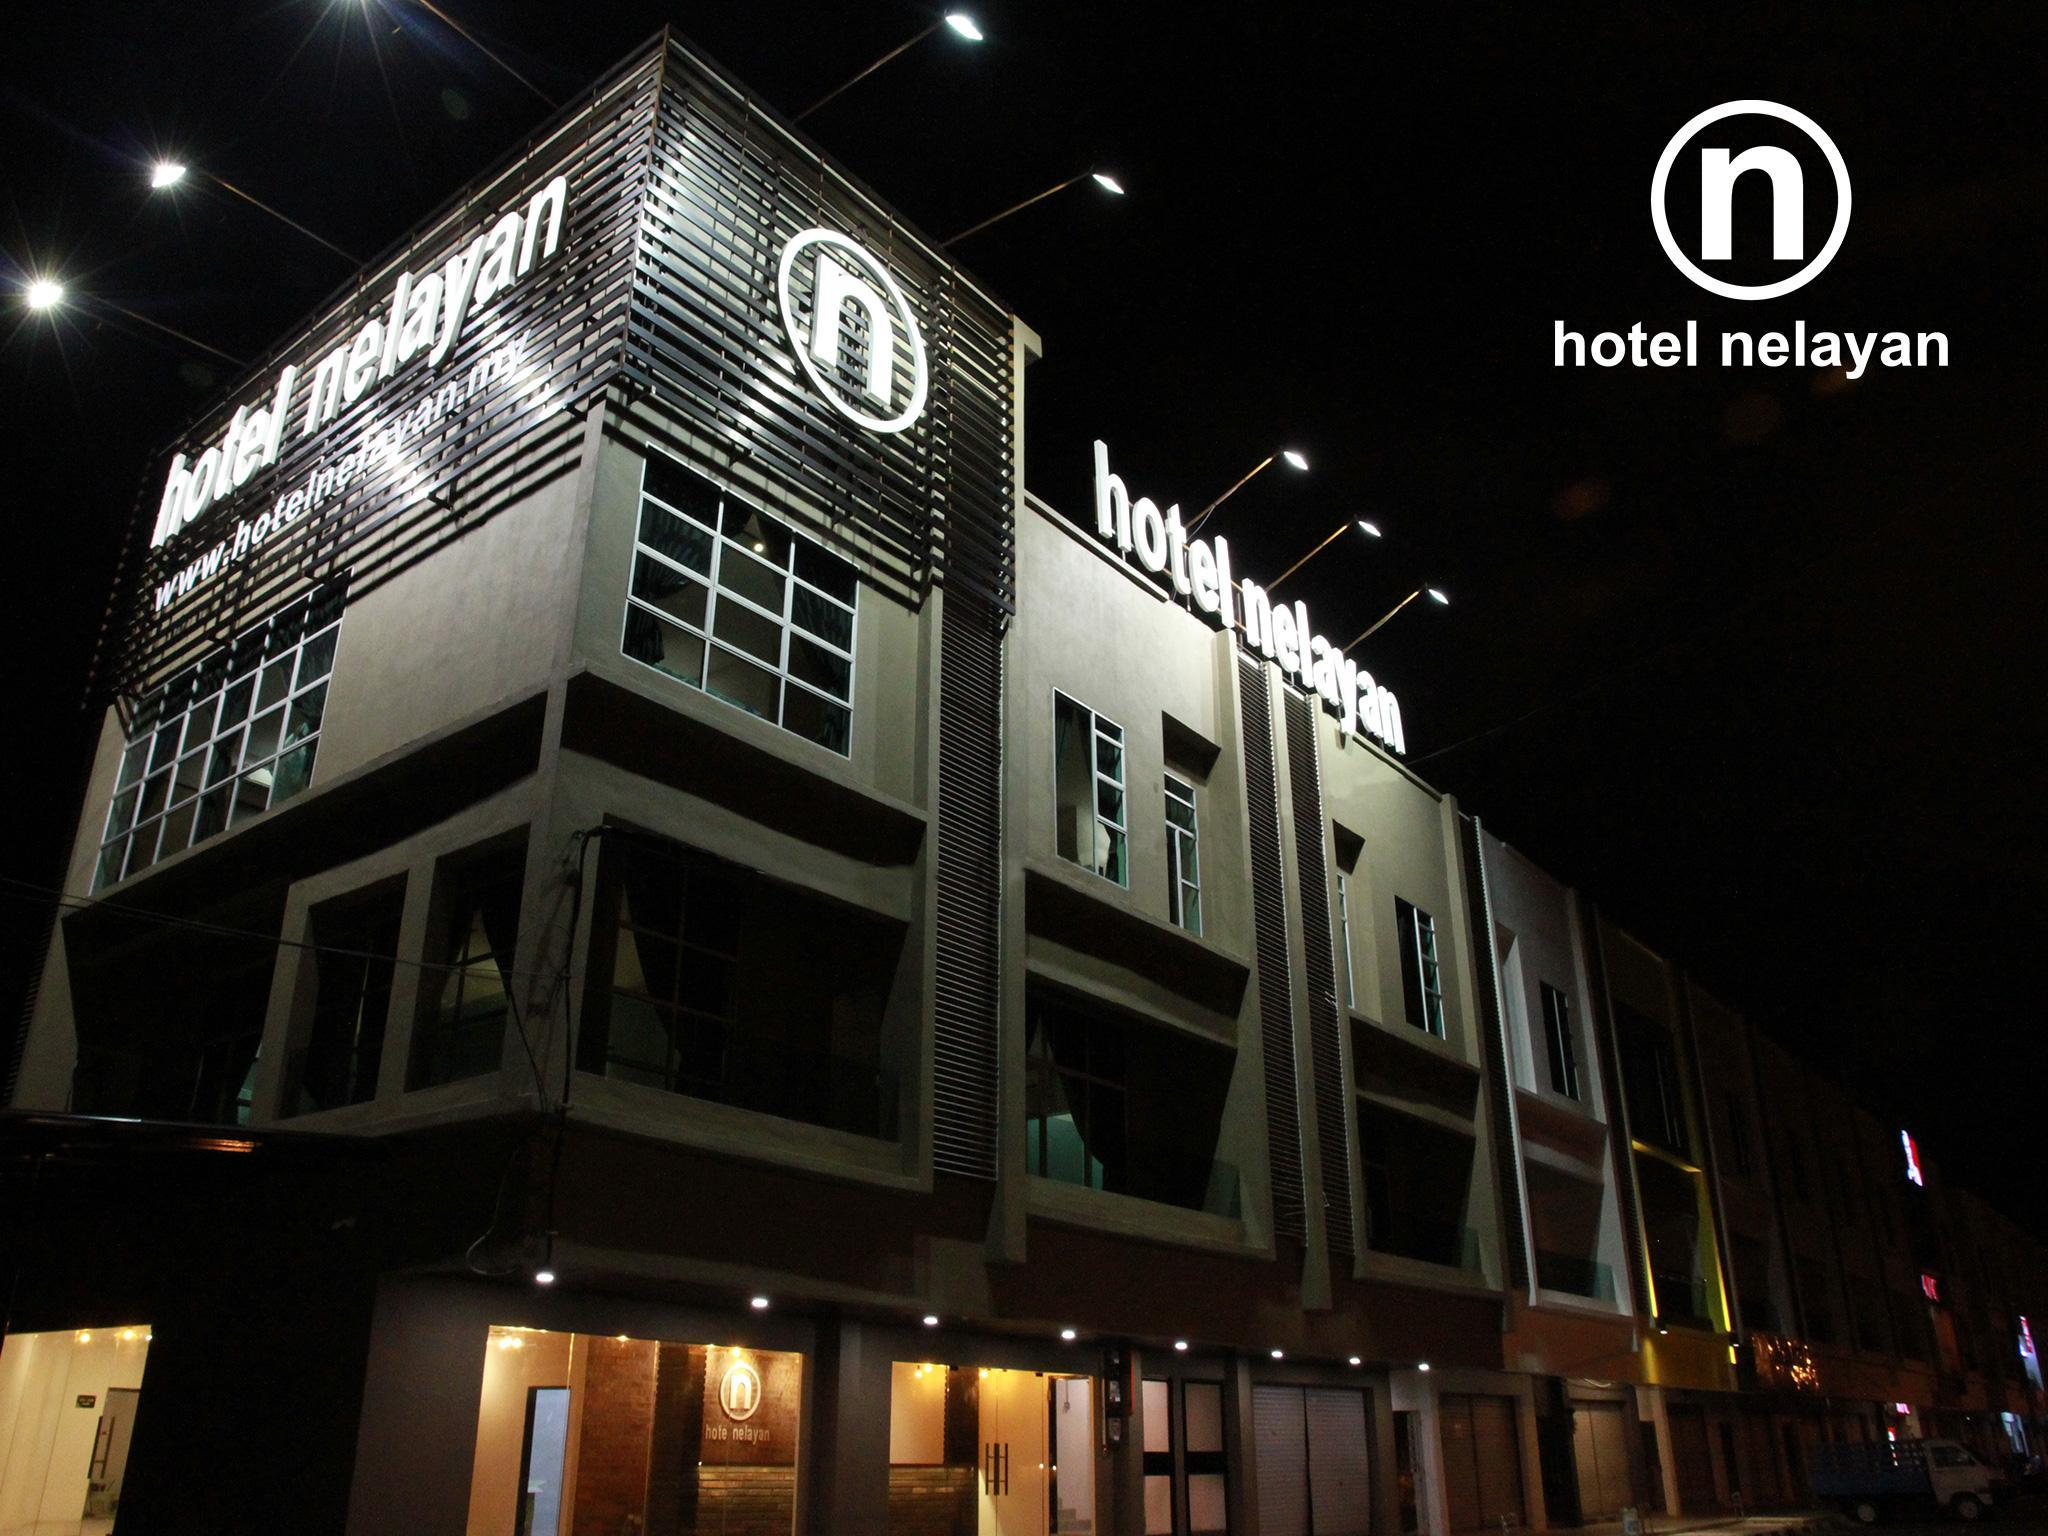 Hotel Nelayan